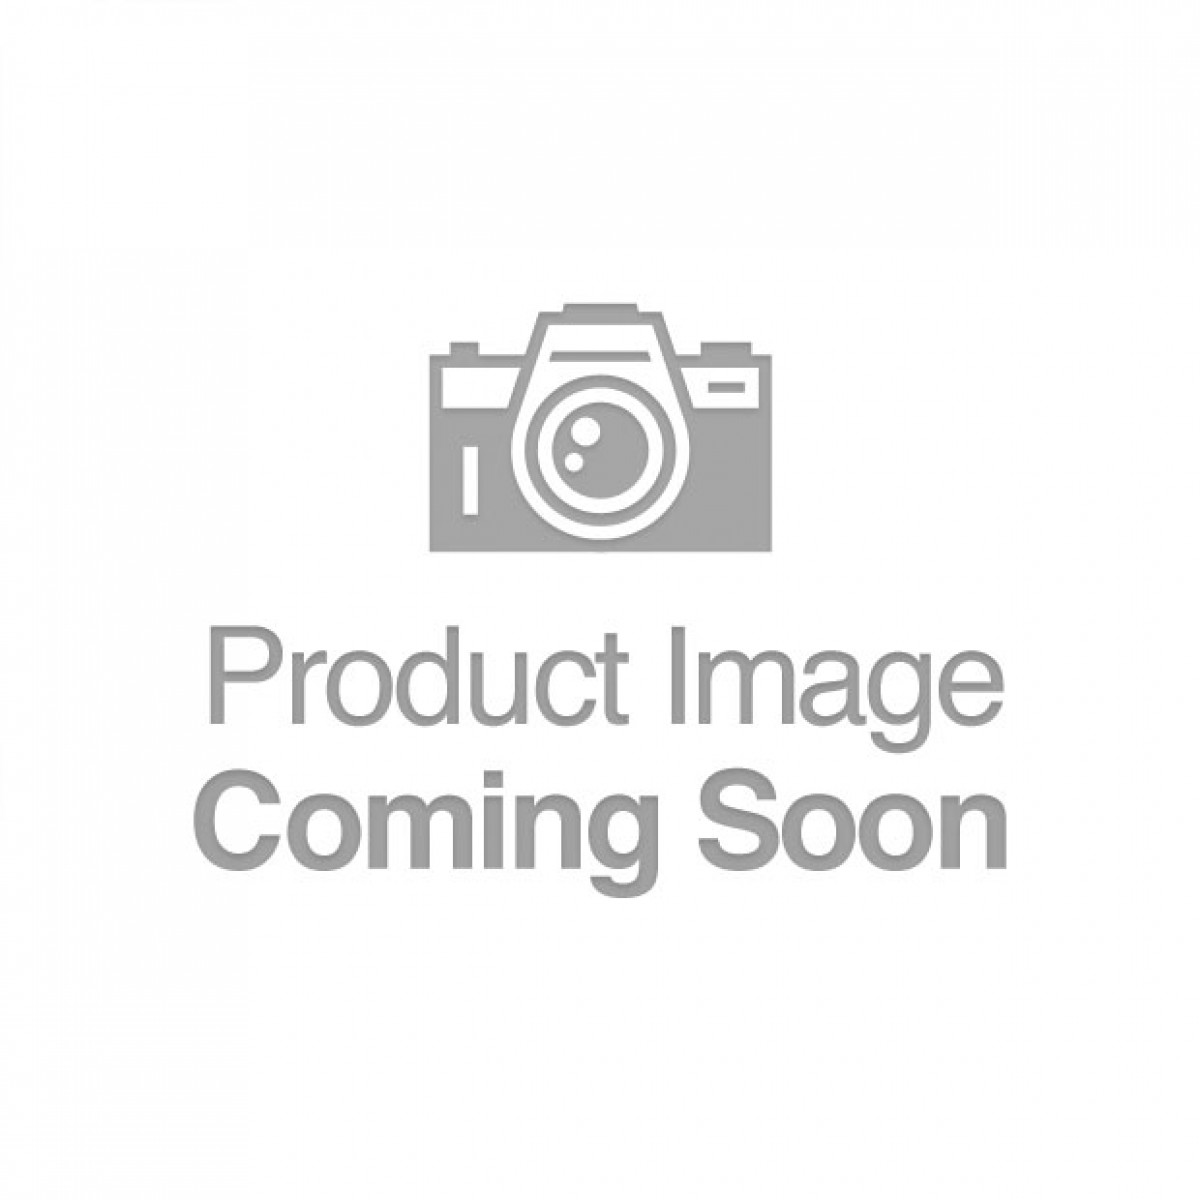 Kama Sutra Aromatic Oil - 8 Oz Sweet Almond